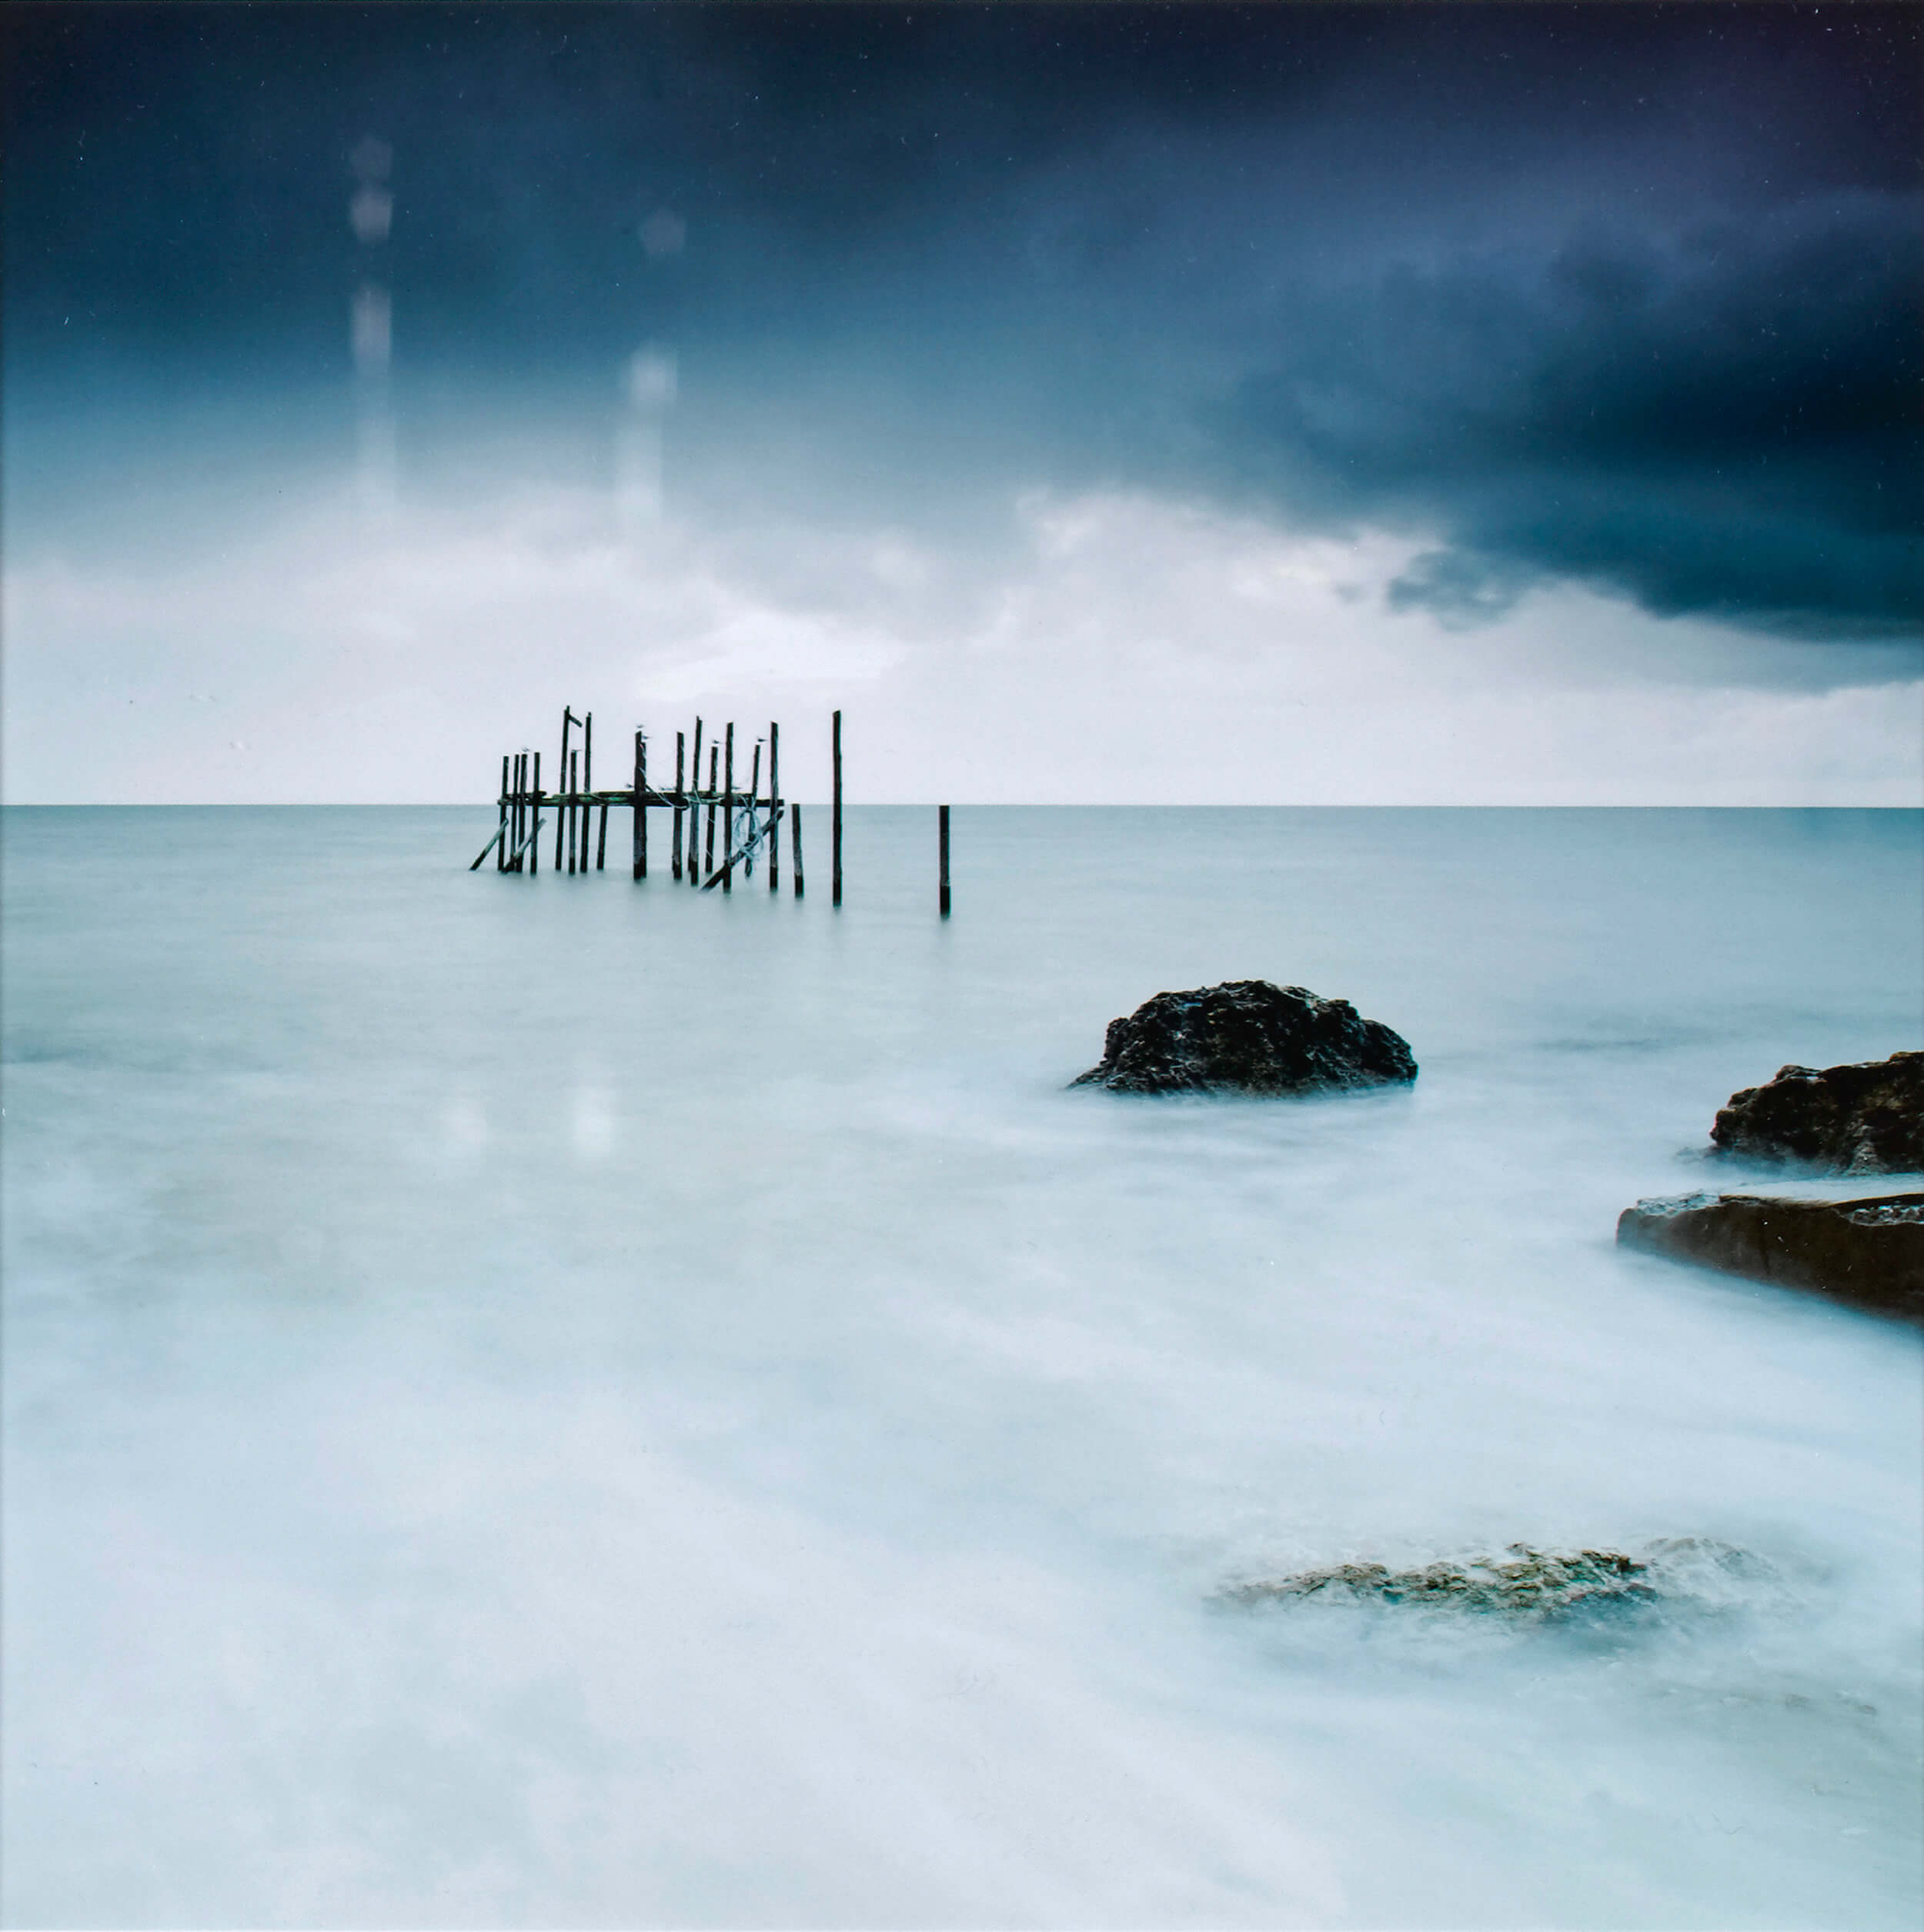 David BADENS - Icy World - Papier photo, 30 x 30cm